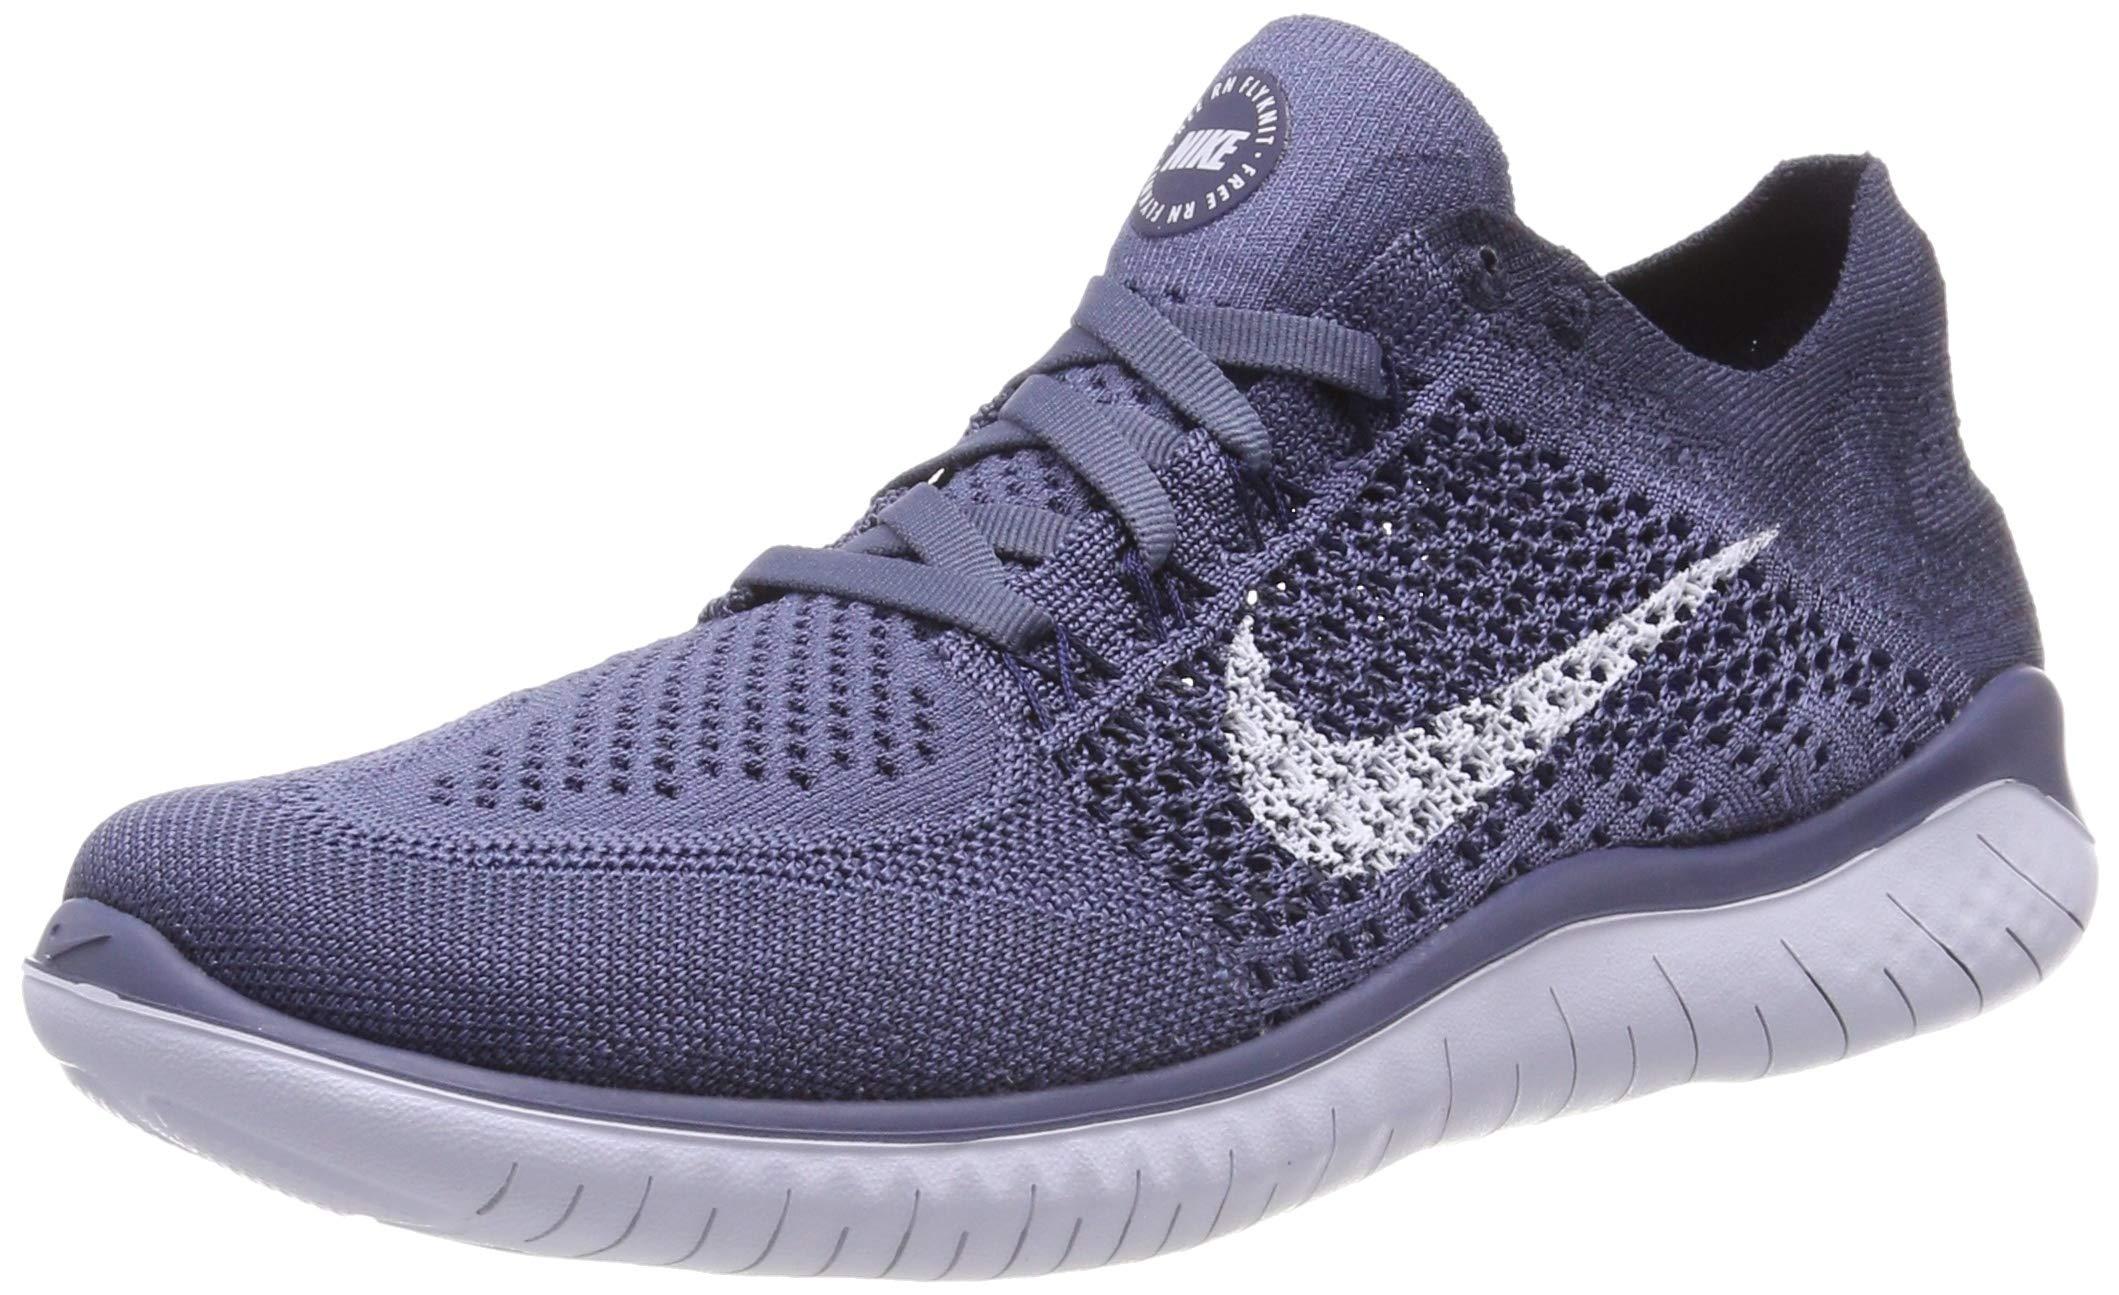 de4b167a855ee Galleon - Nike Free RN Flyknit 2018 Men s Running Shoe DIFFUSED  Blue Football Grey-Thunder Blue 8.0